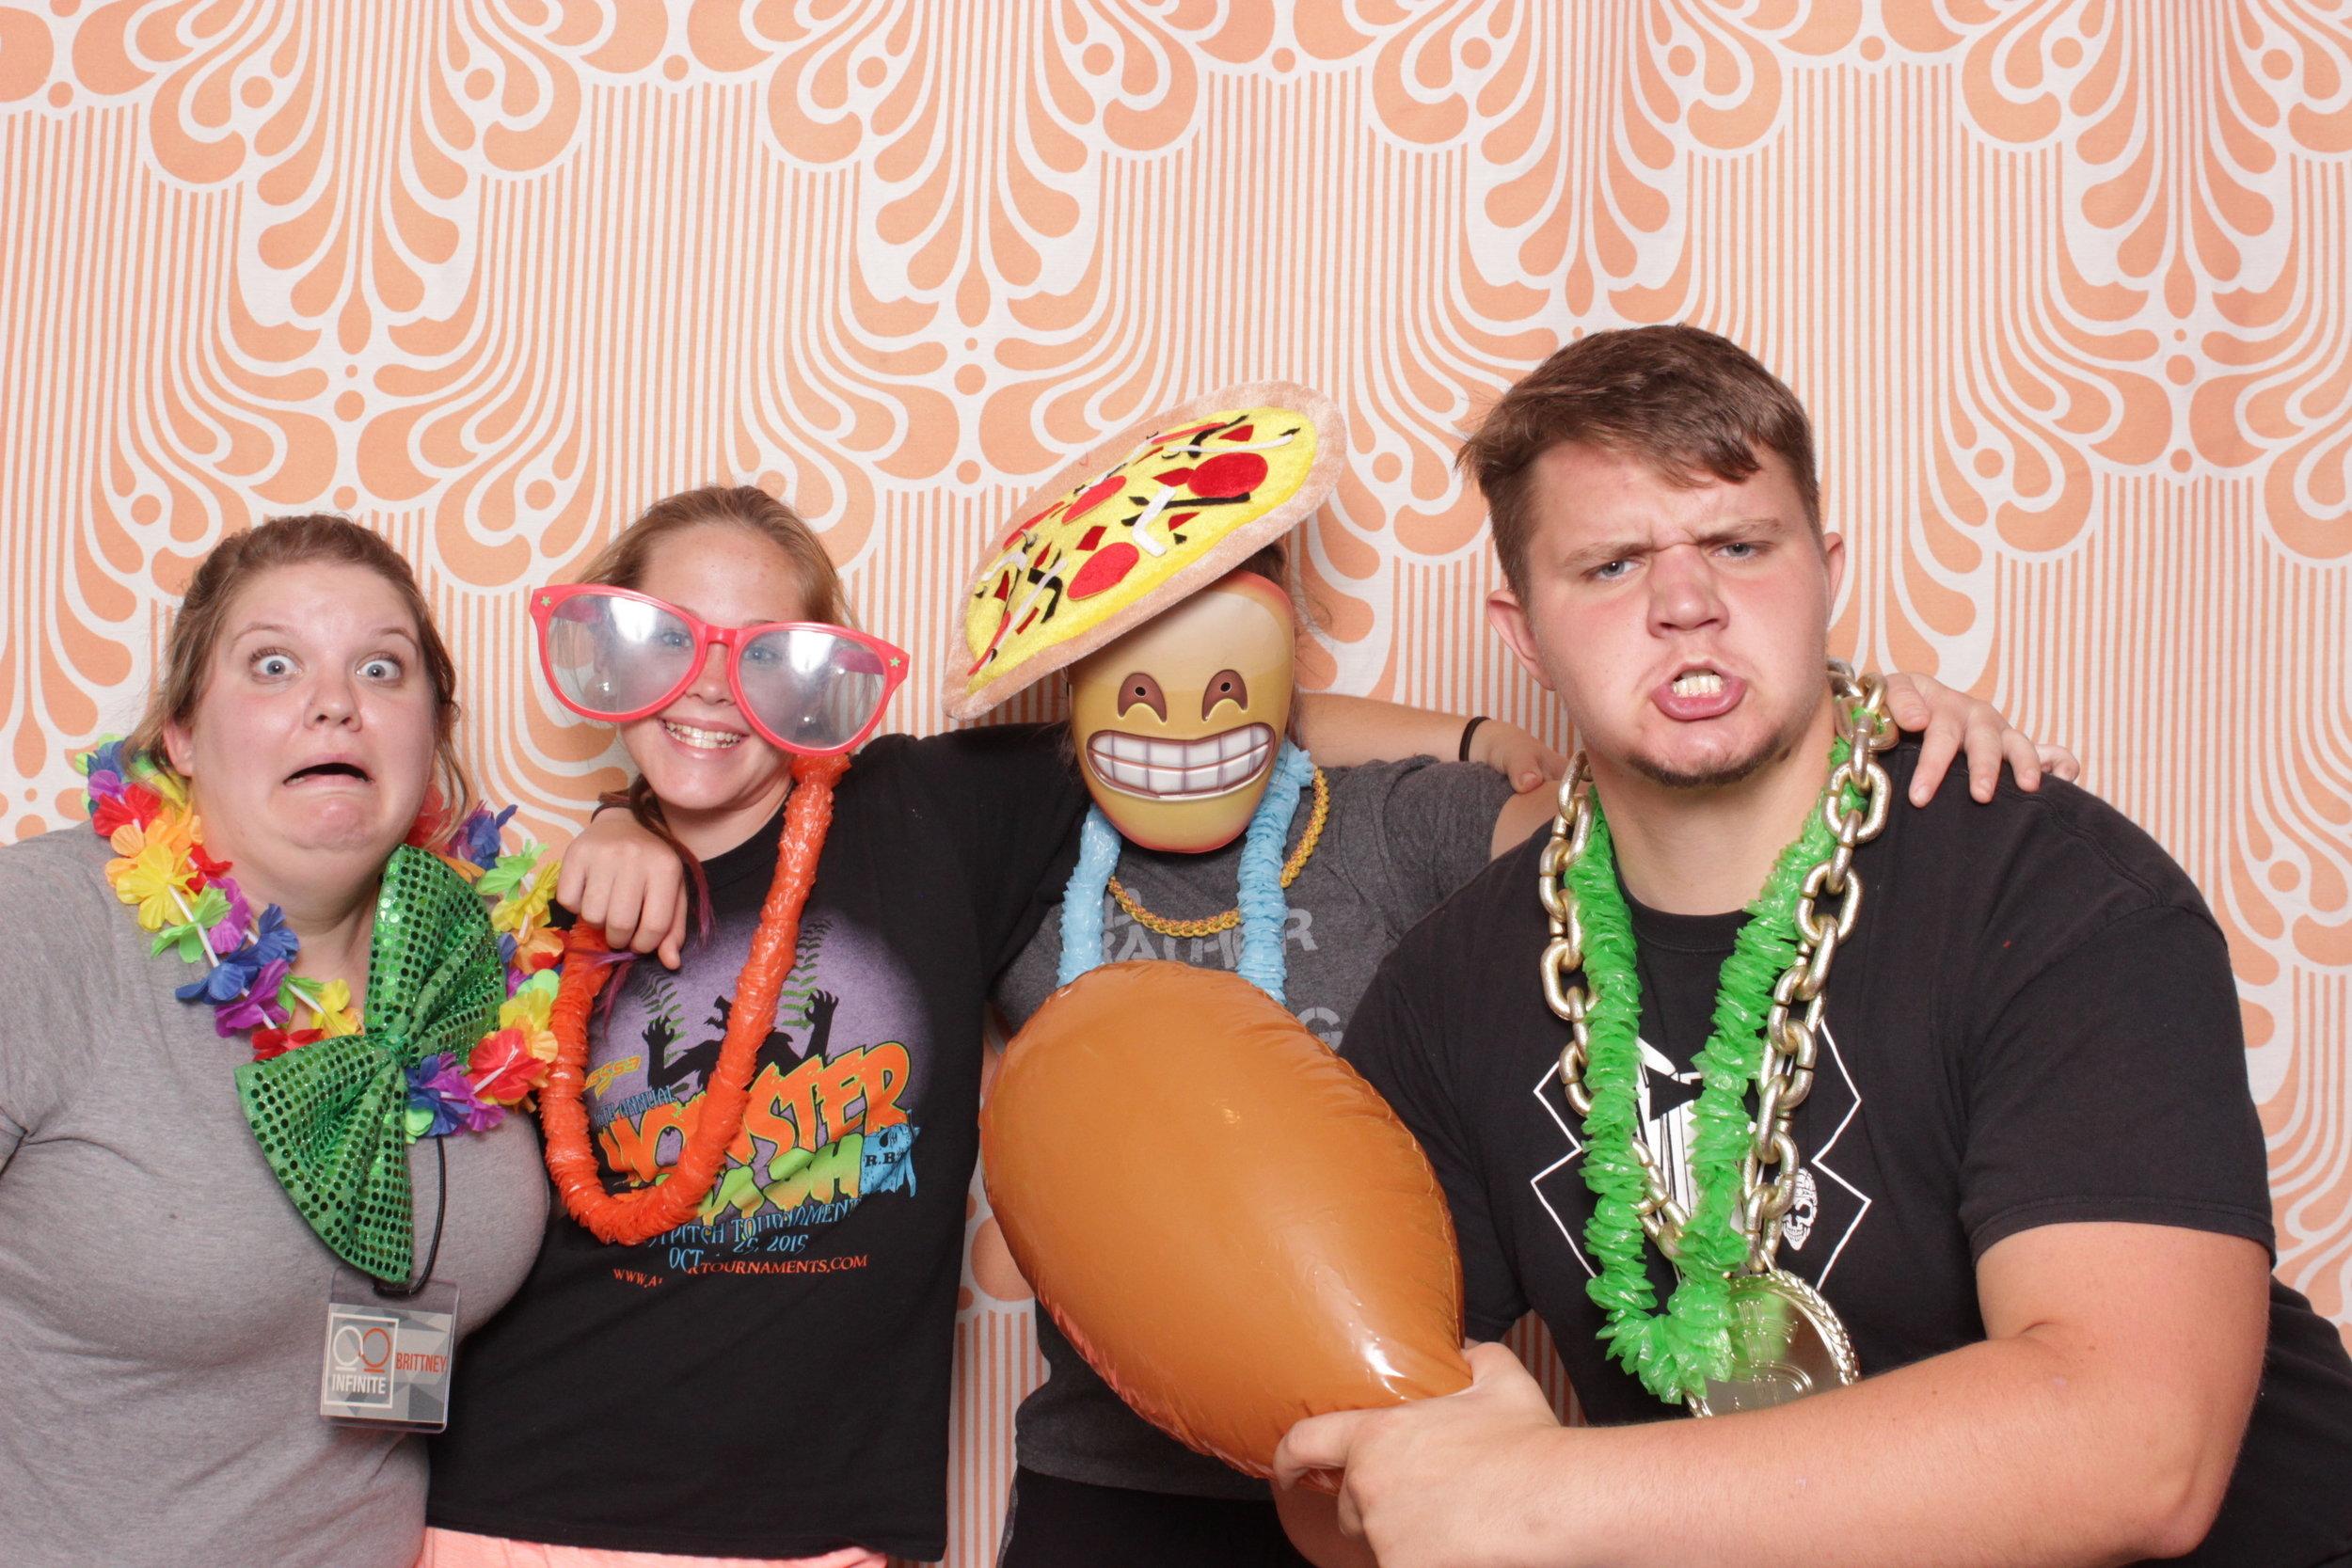 Infinite-hawaiian-luau-party-photo-booth-rental-chico-caleb